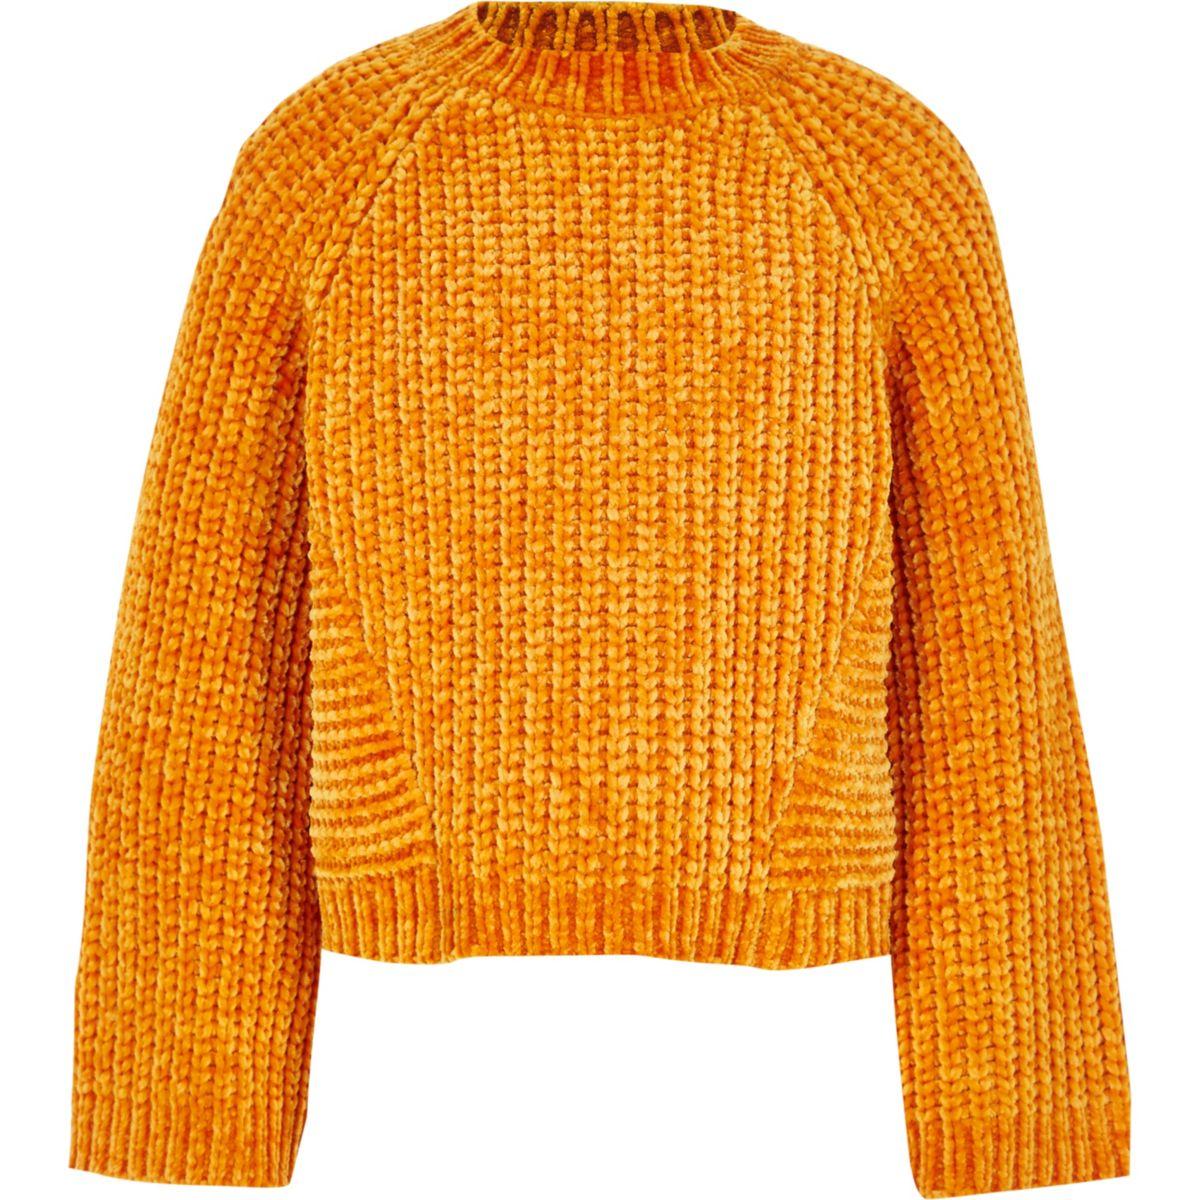 Girls orange chenille knit jumper